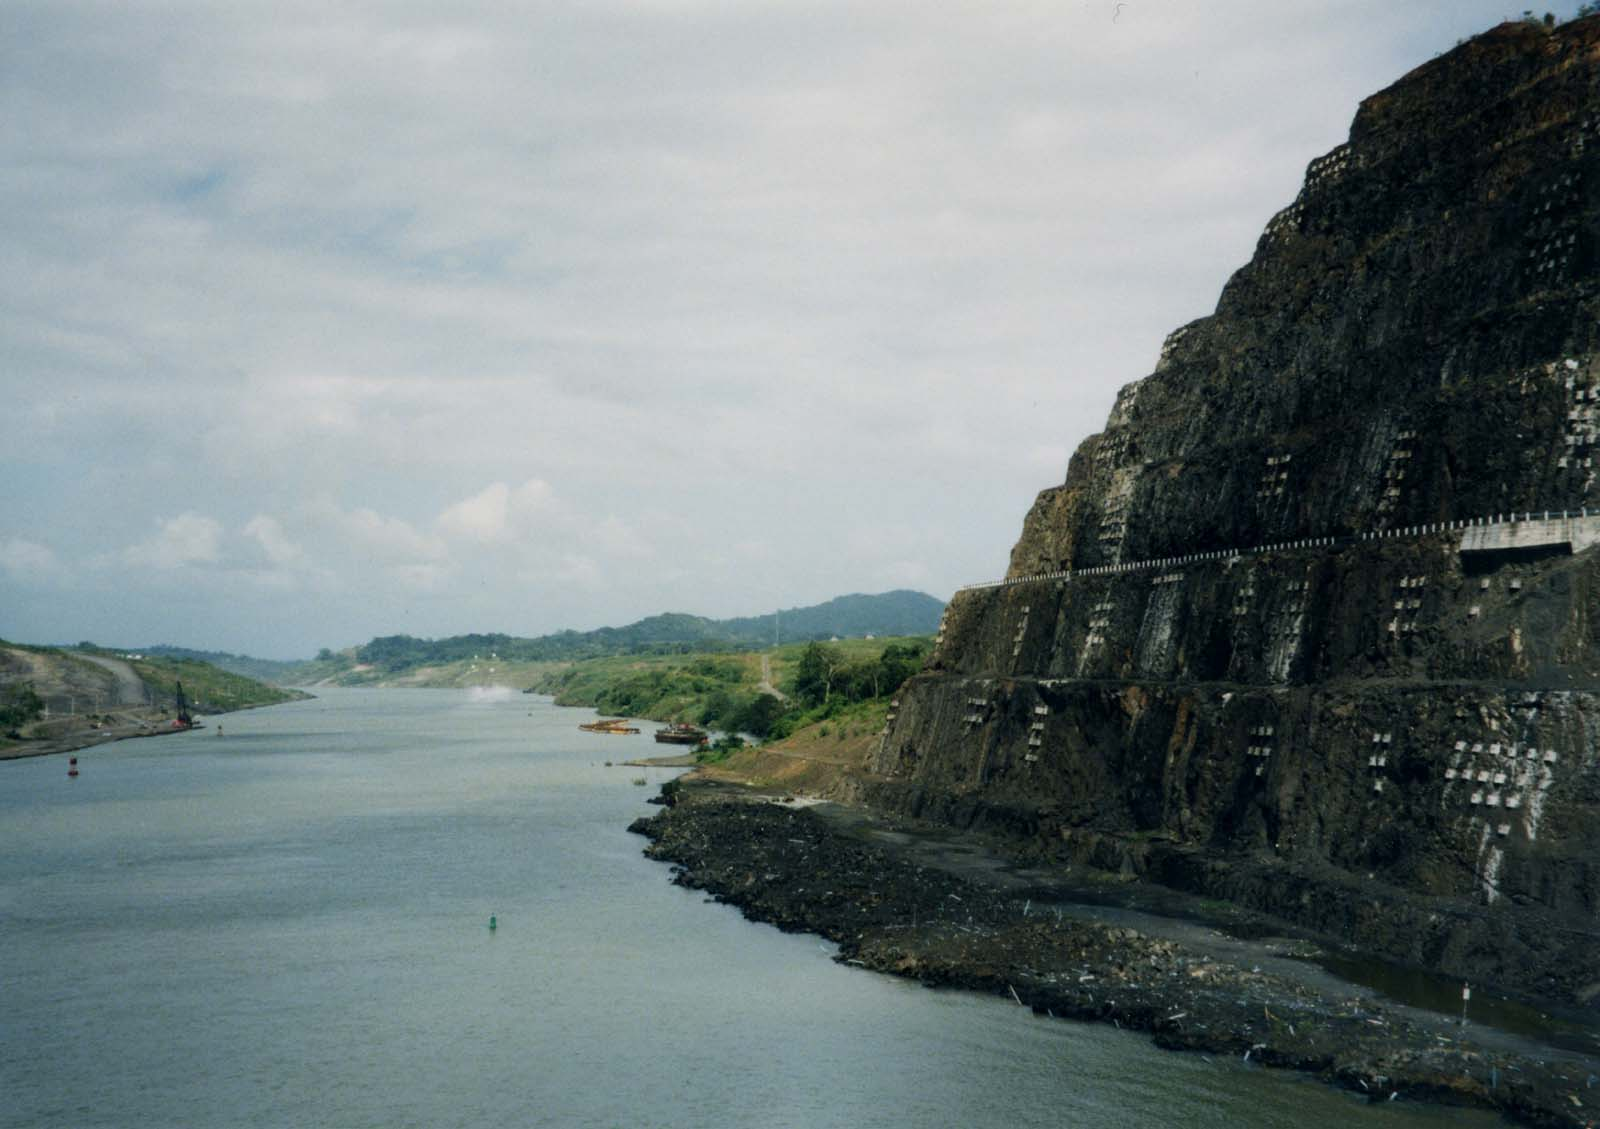 File:Panama Canal Gaillard Cut.jpg - Wikimedia Commons